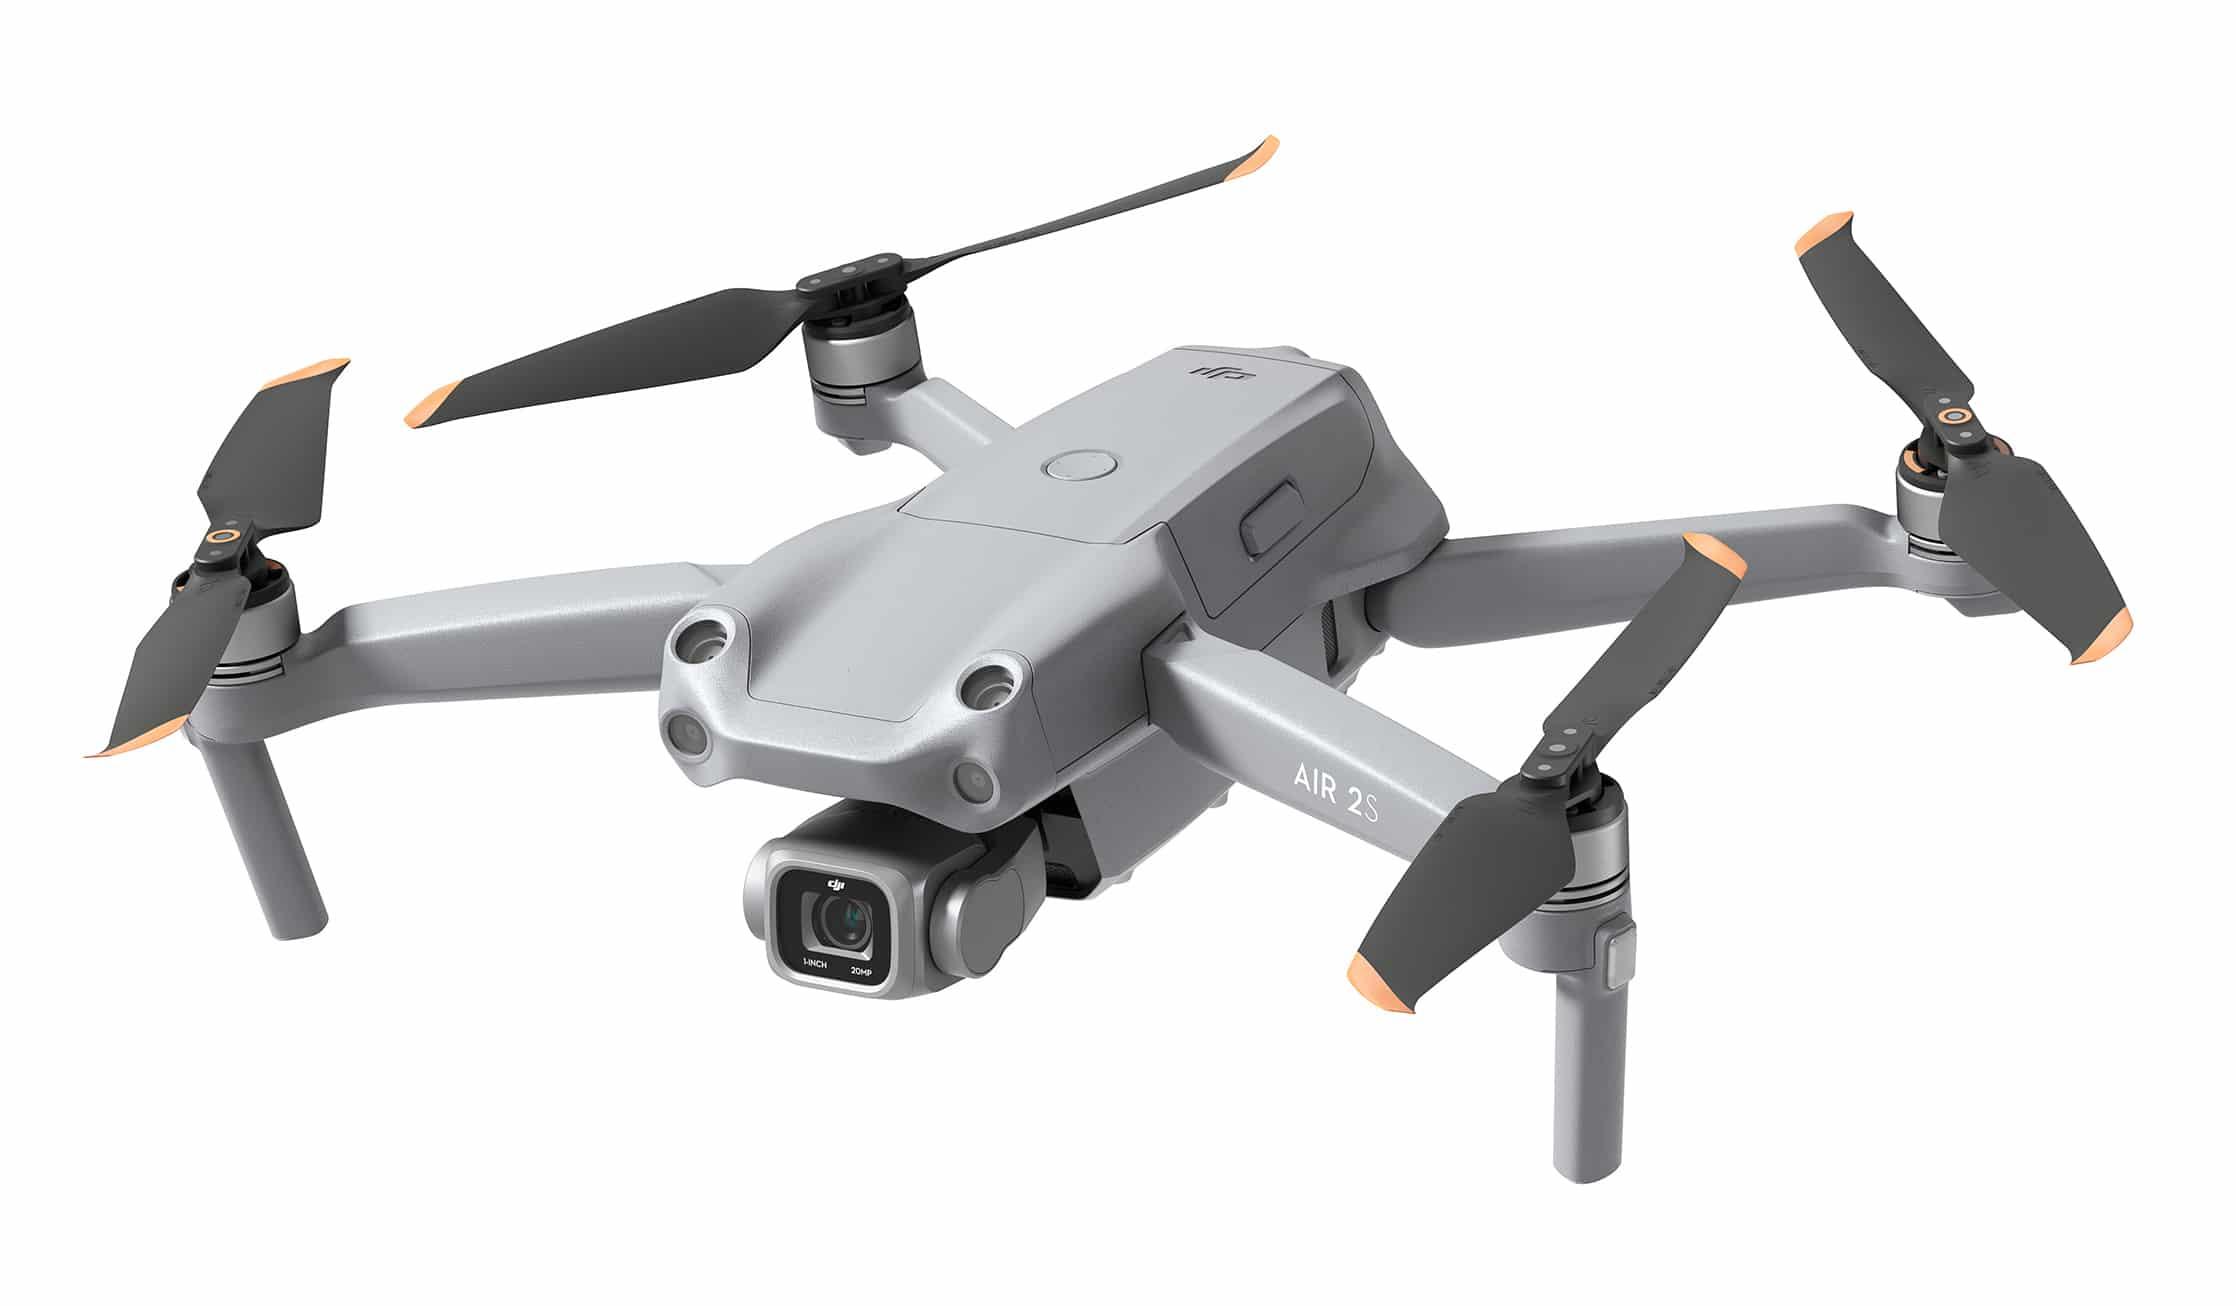 DJI-AIR-2S-Drone-location